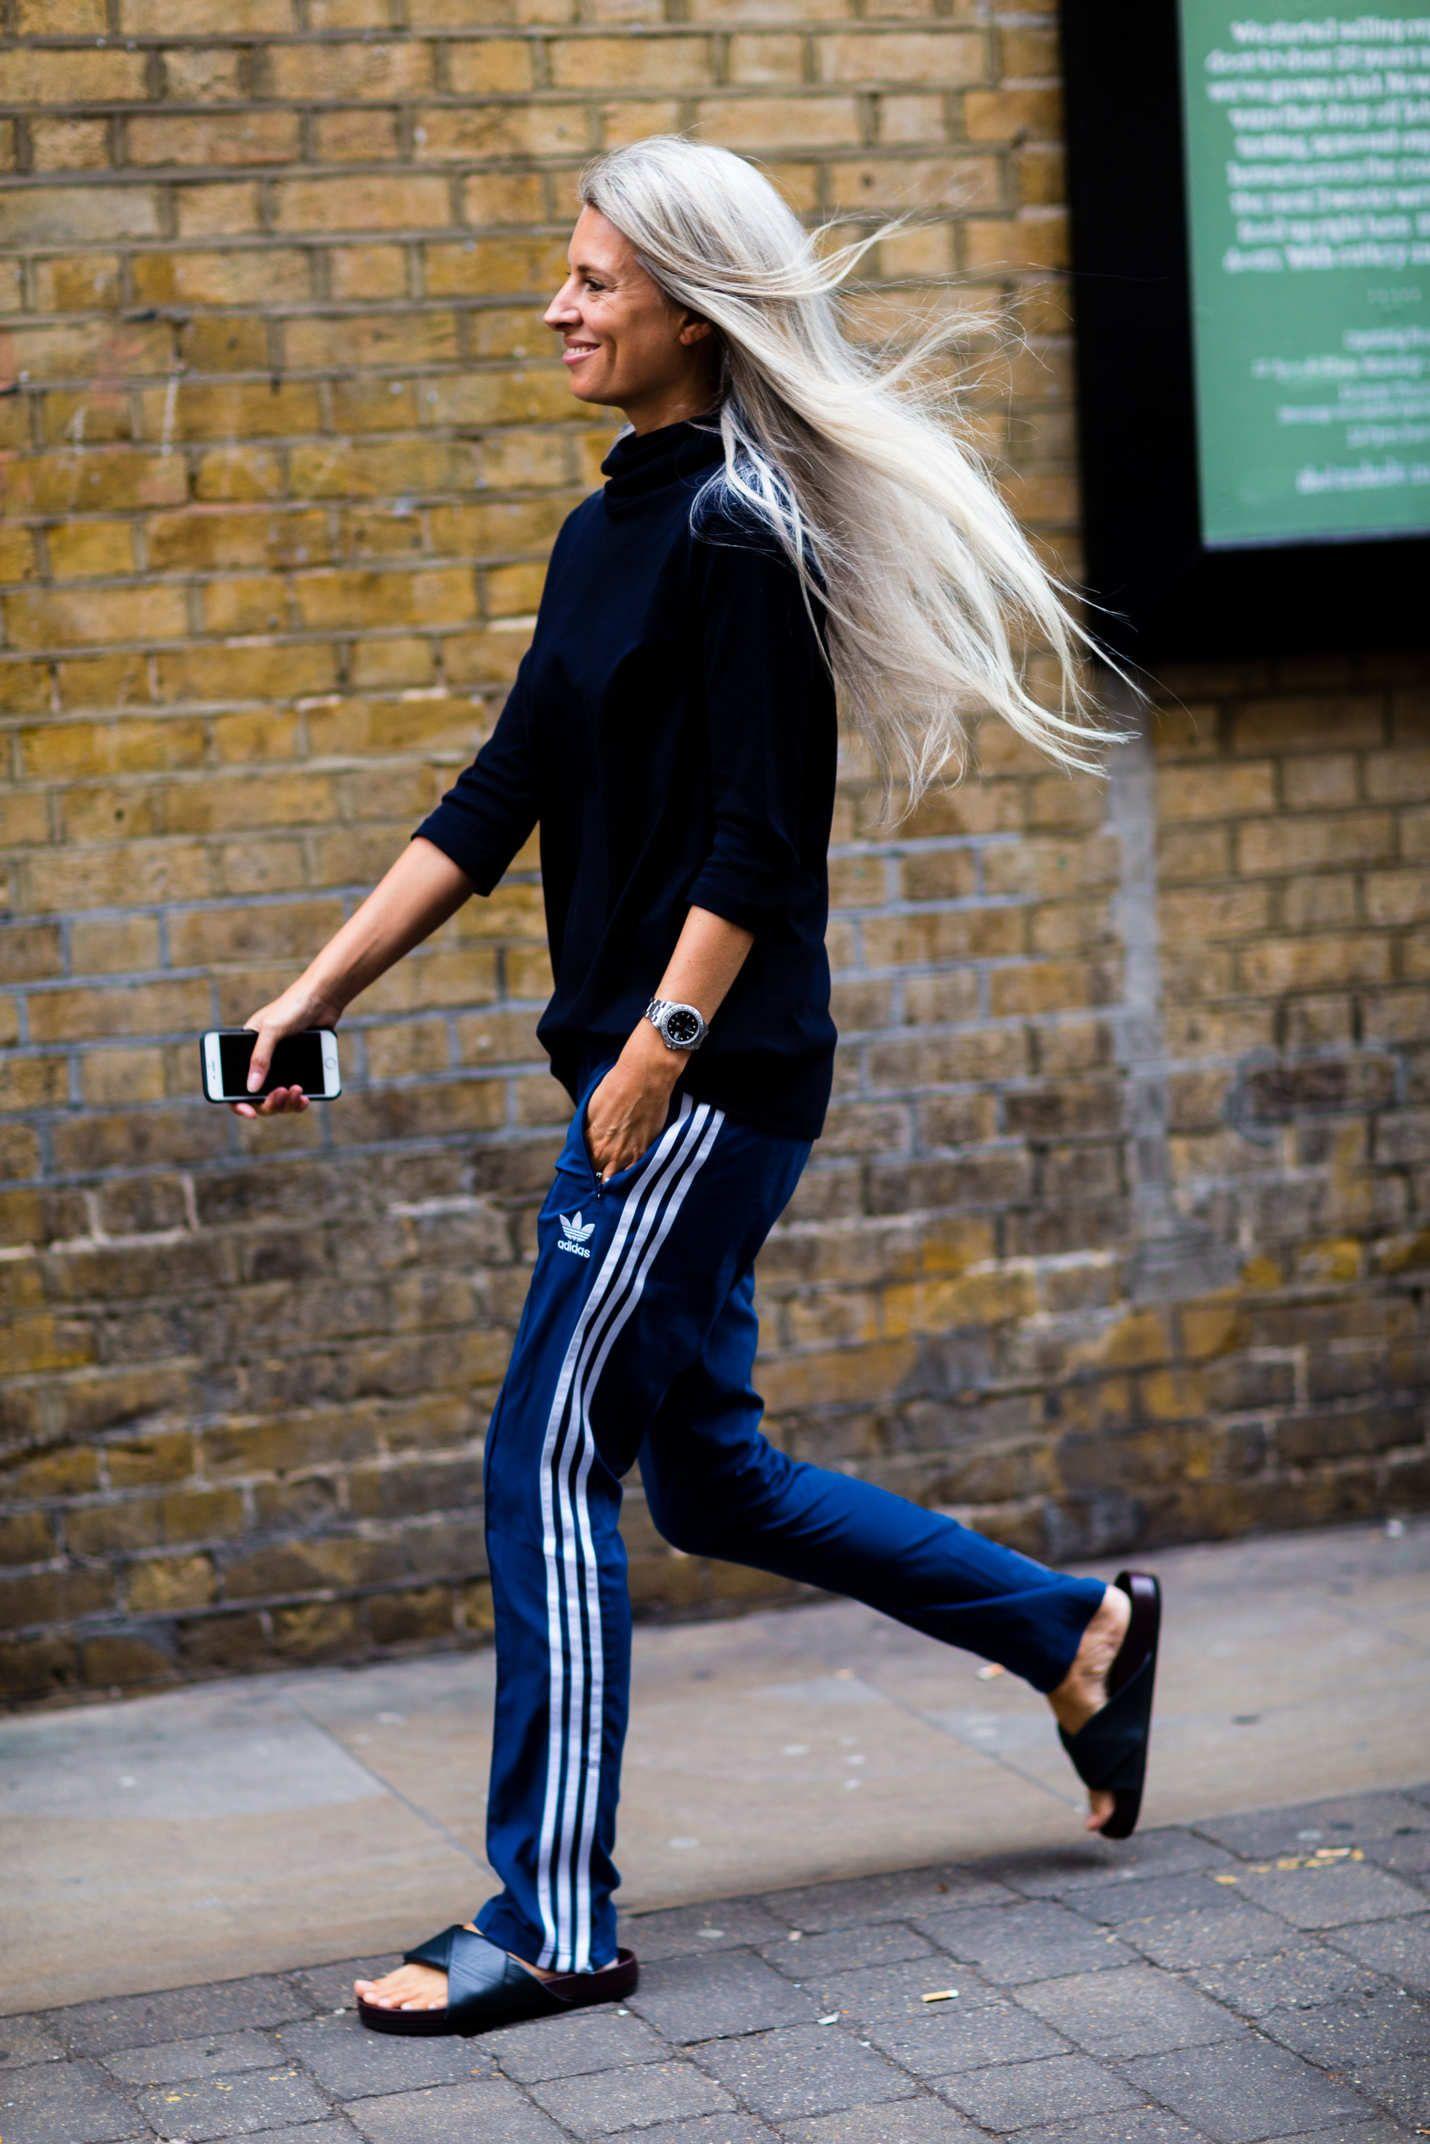 adb9eef02 Like the adidas pants